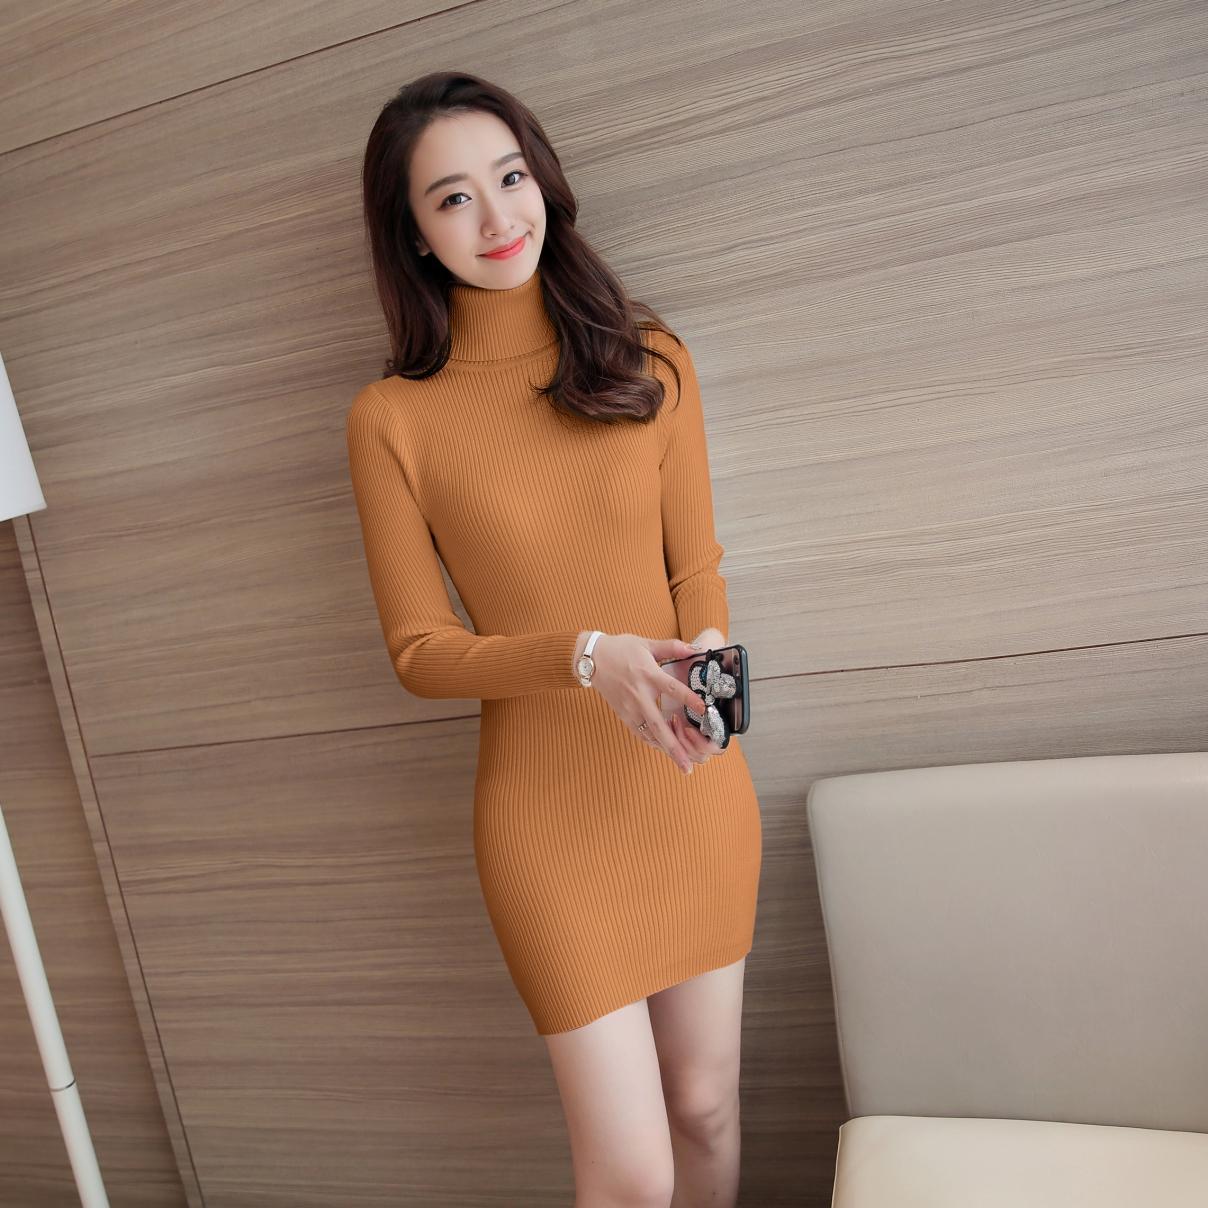 Video turtle Sexy Knit Dress Fashion 2018 New Womens Autumn Spring Long Sleeve Dresses Famale OL Elegant Slim Dress